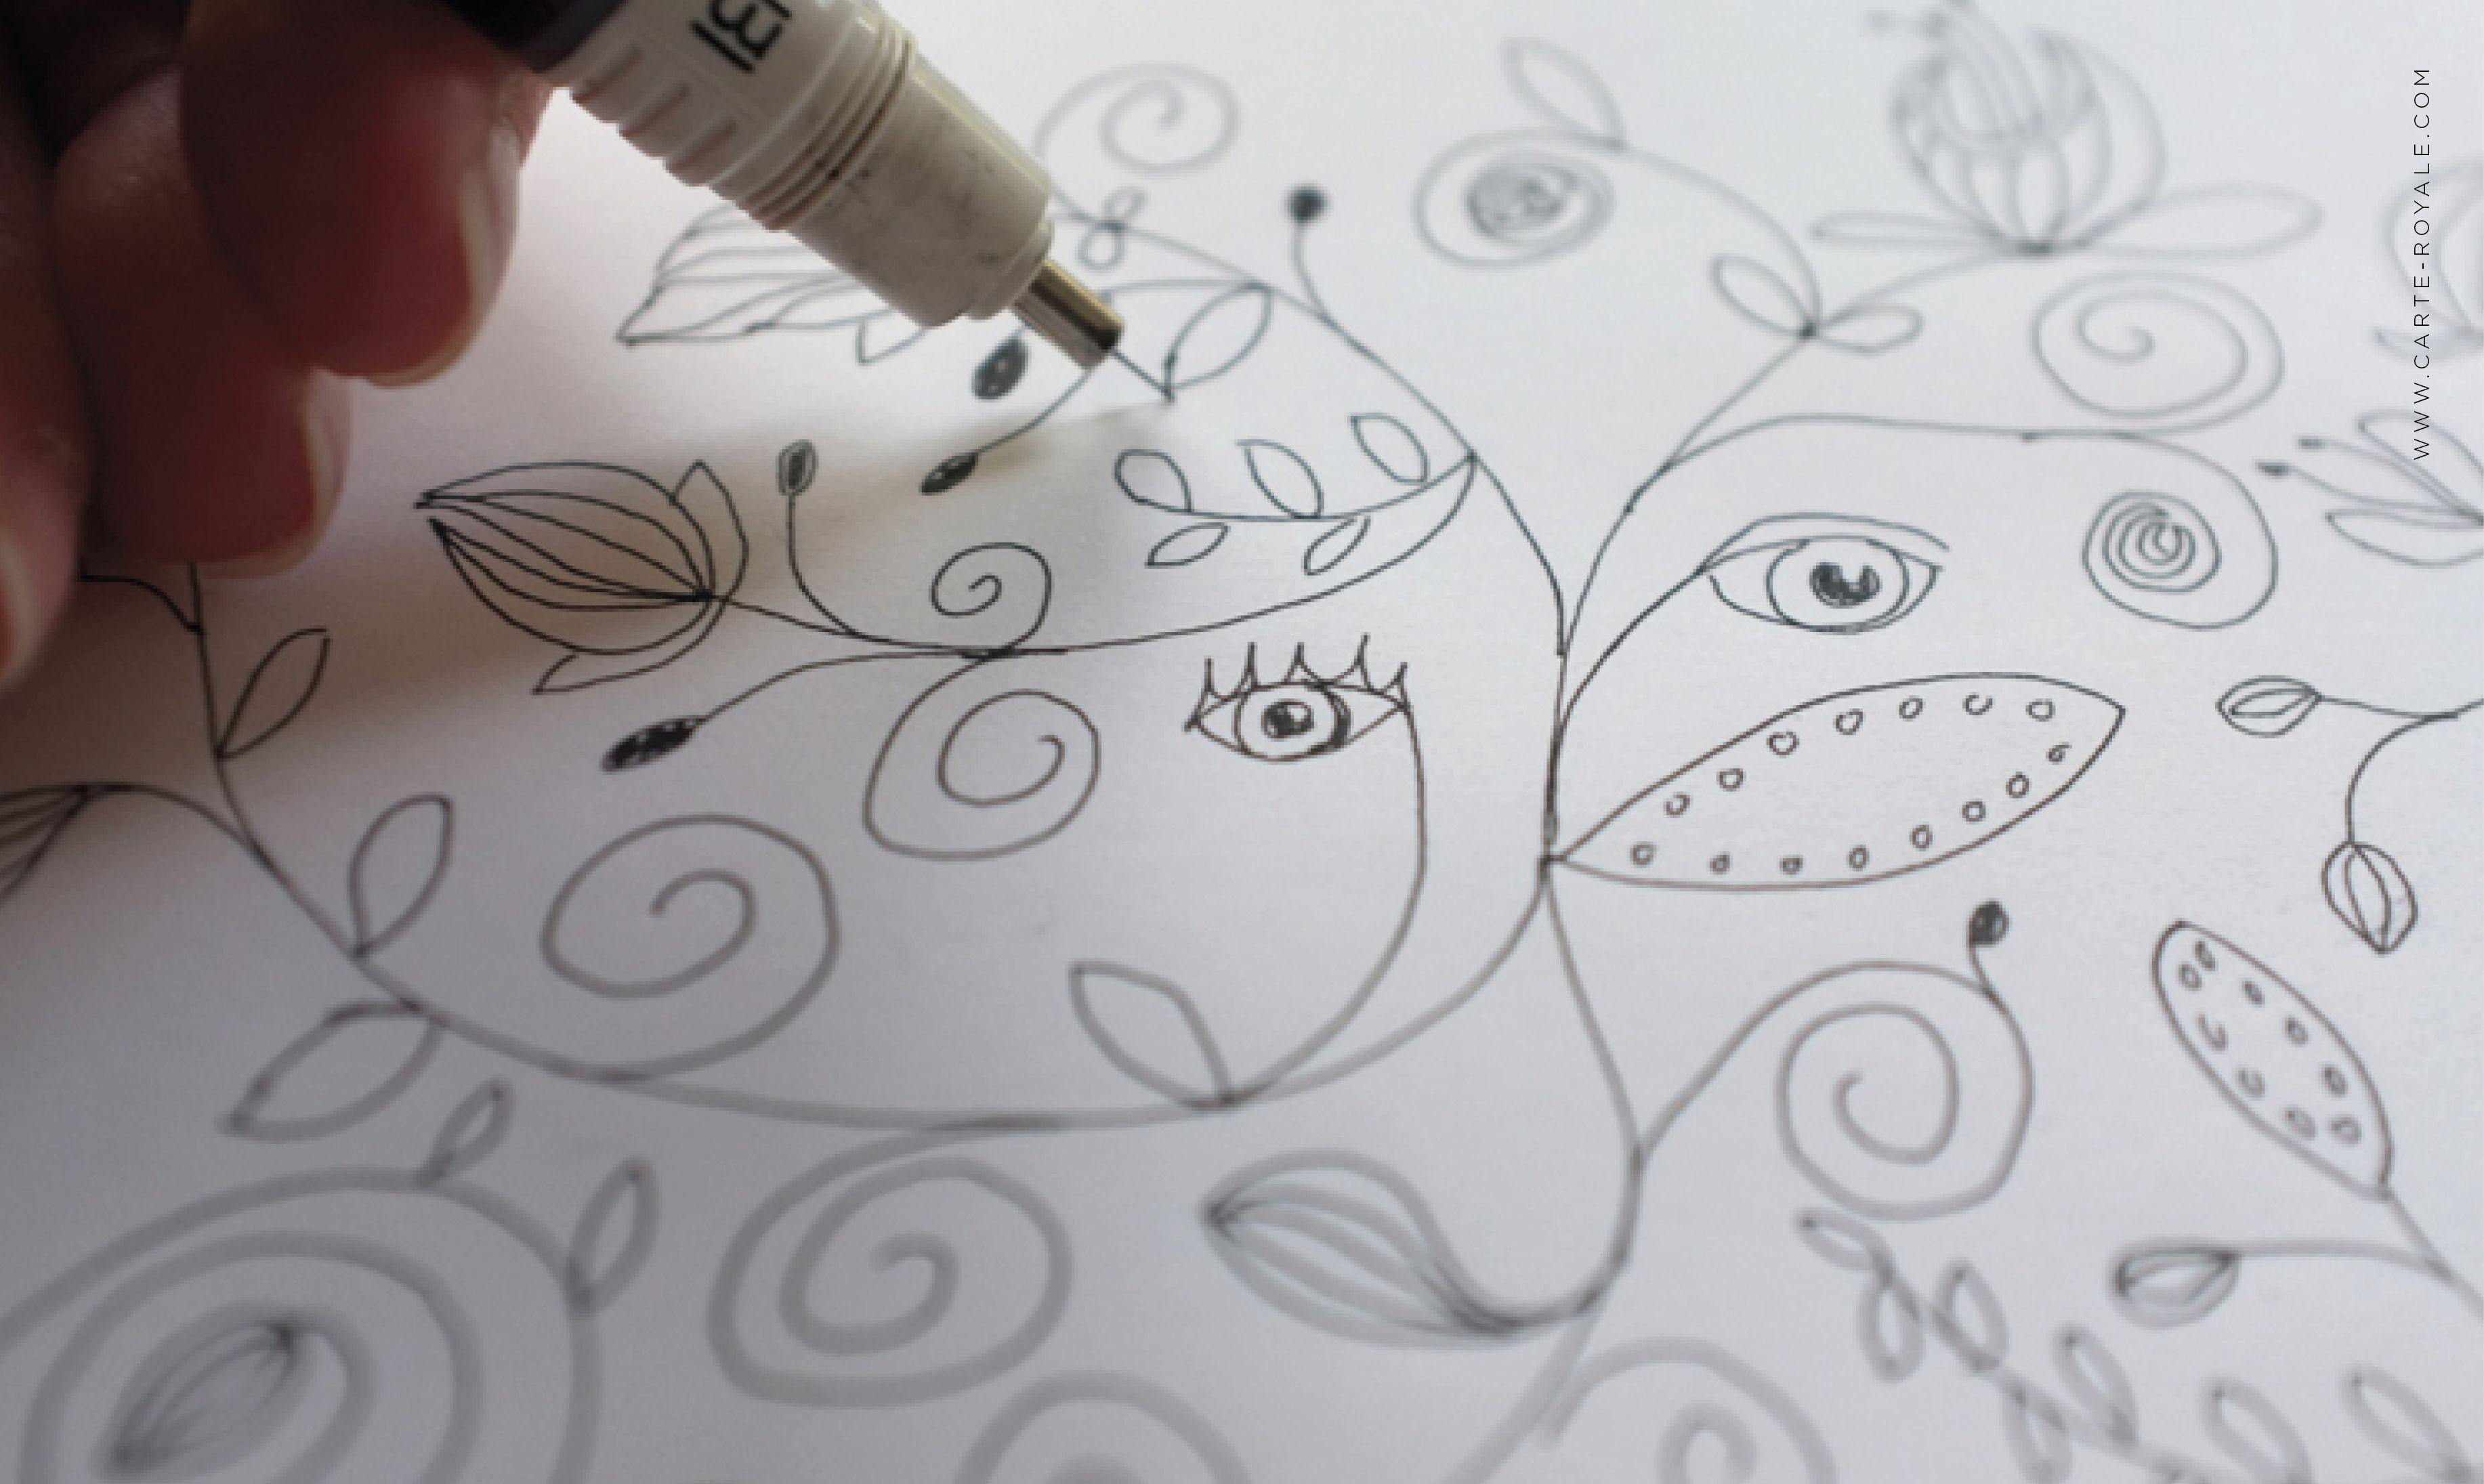 "Handgezeichnetes Motiv aus der Hochzeitspapeterie-Serie ""Les Curieux"" von www.carte-royale.com"